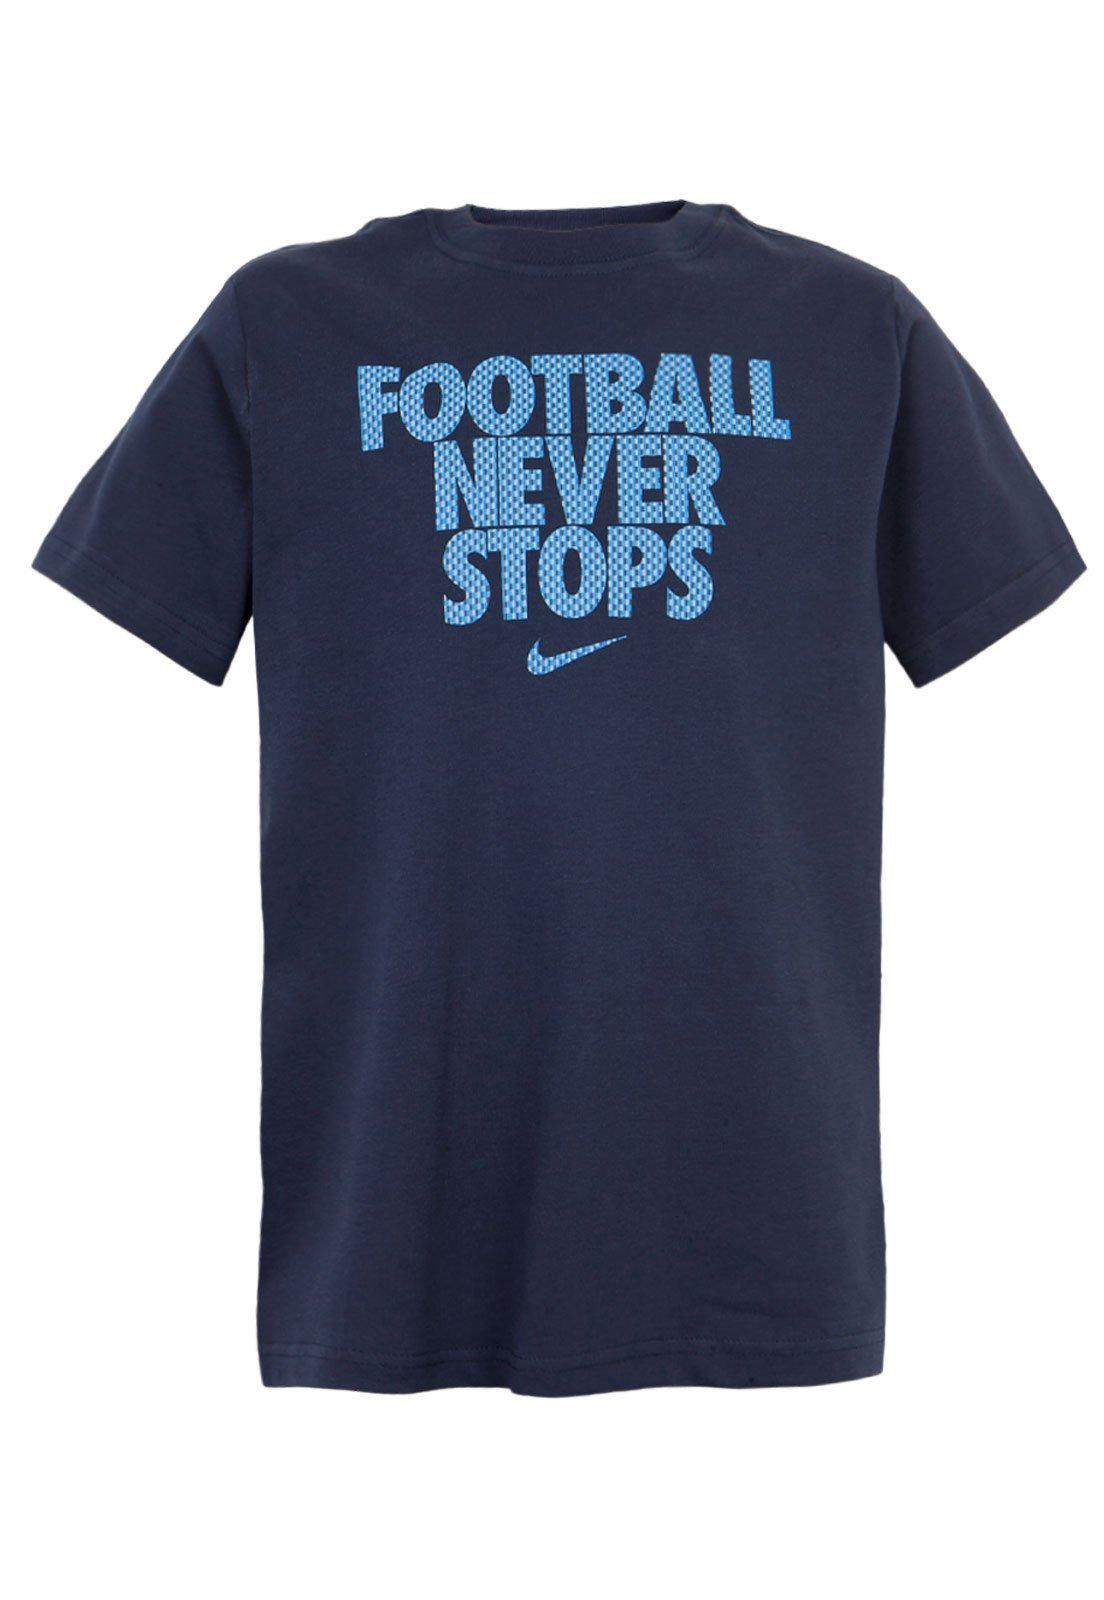 pálido Sobriqueta Peatonal  Camiseta Nike Football NVR Stops TD Azul - Compre Agora   Dafiti Brasil